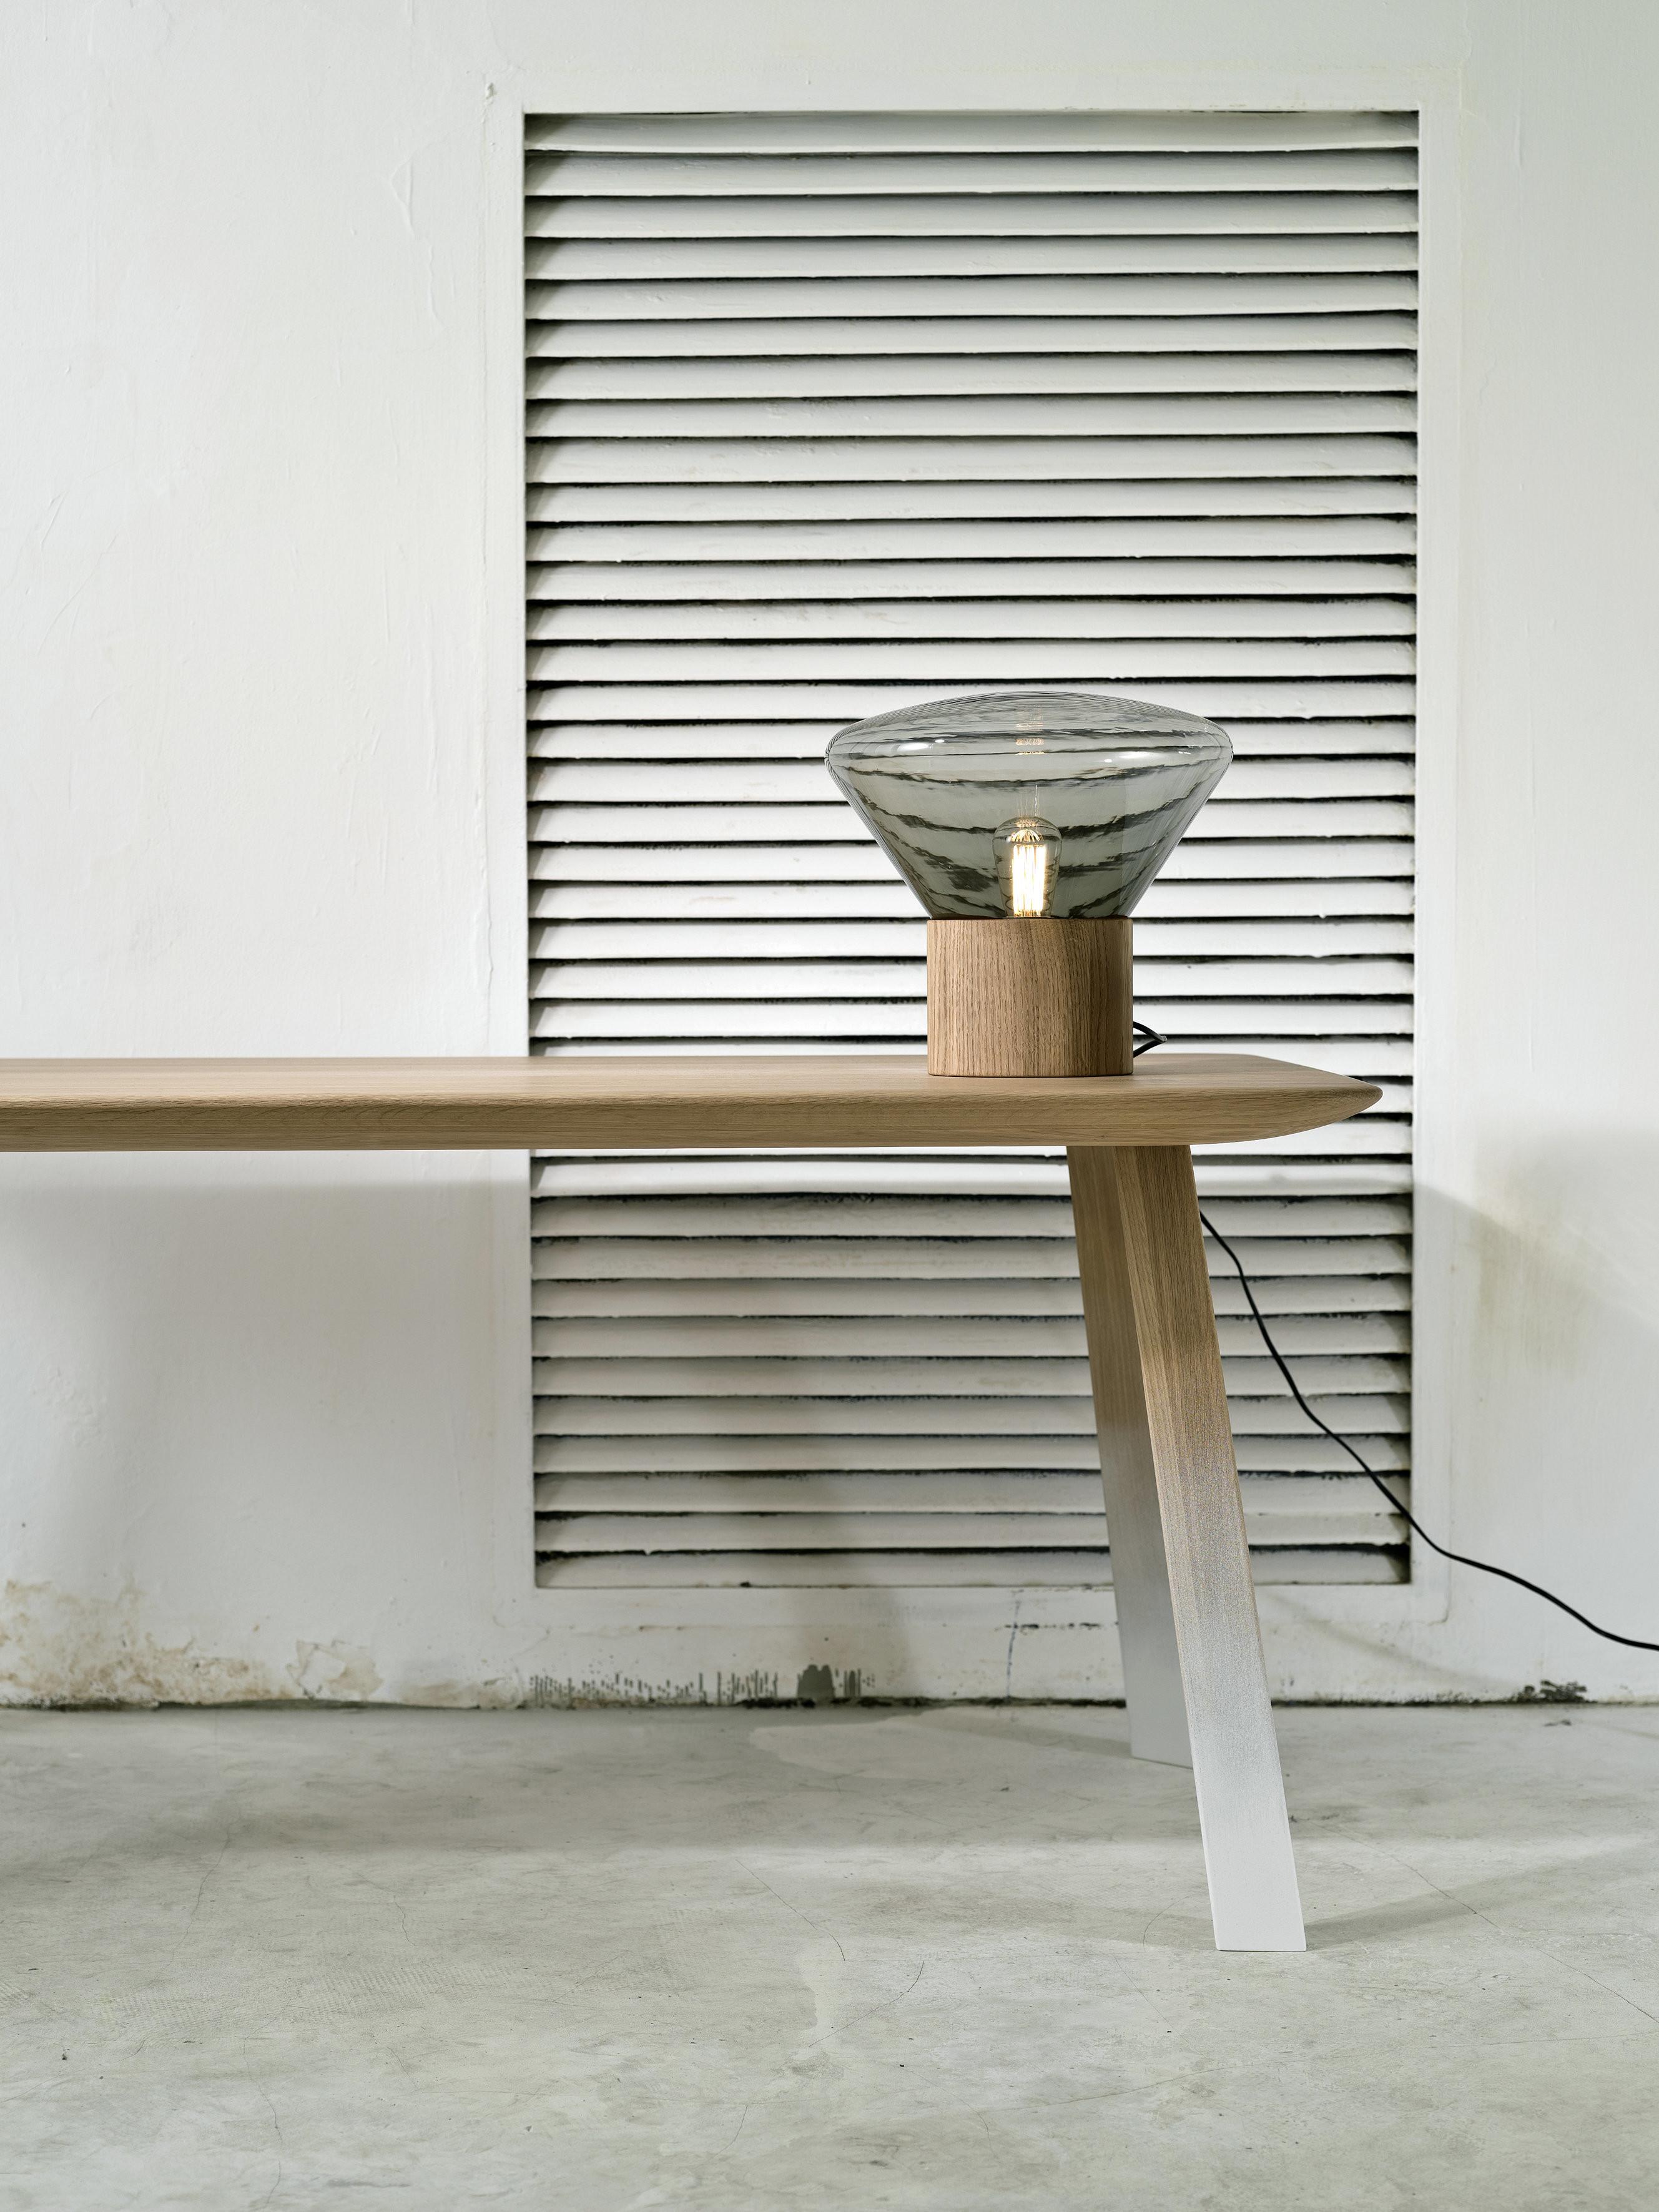 Dan Yeffet & Lucie Koldova lucie koldova studio